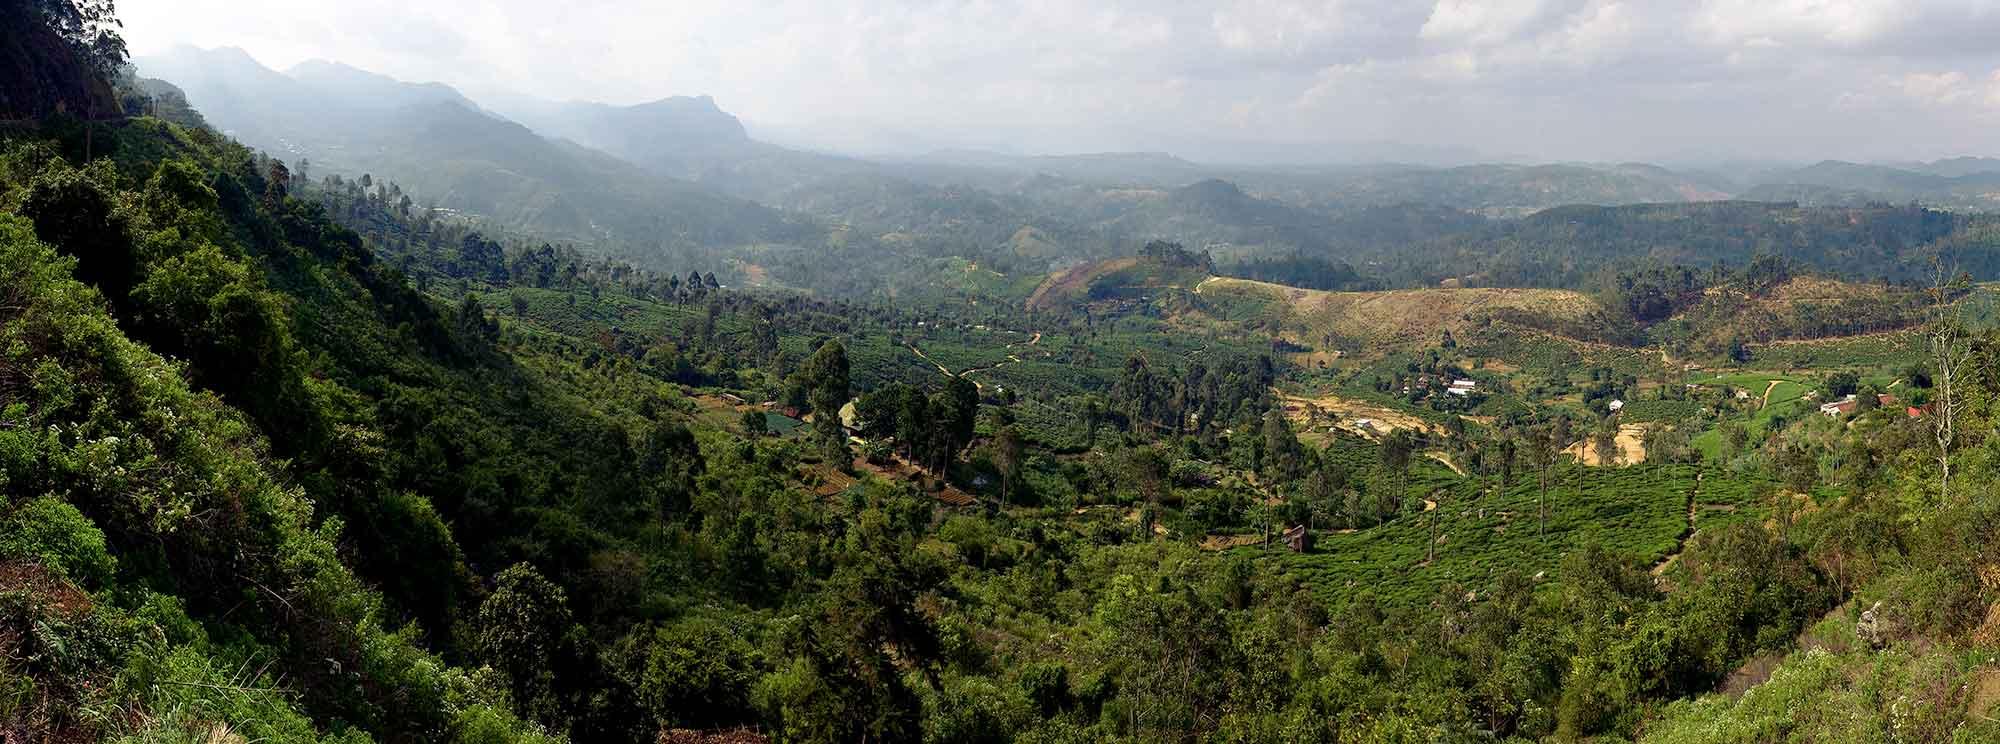 Idalgashina scenery. Foto: KennyOMG CC-BY-SA-4.0